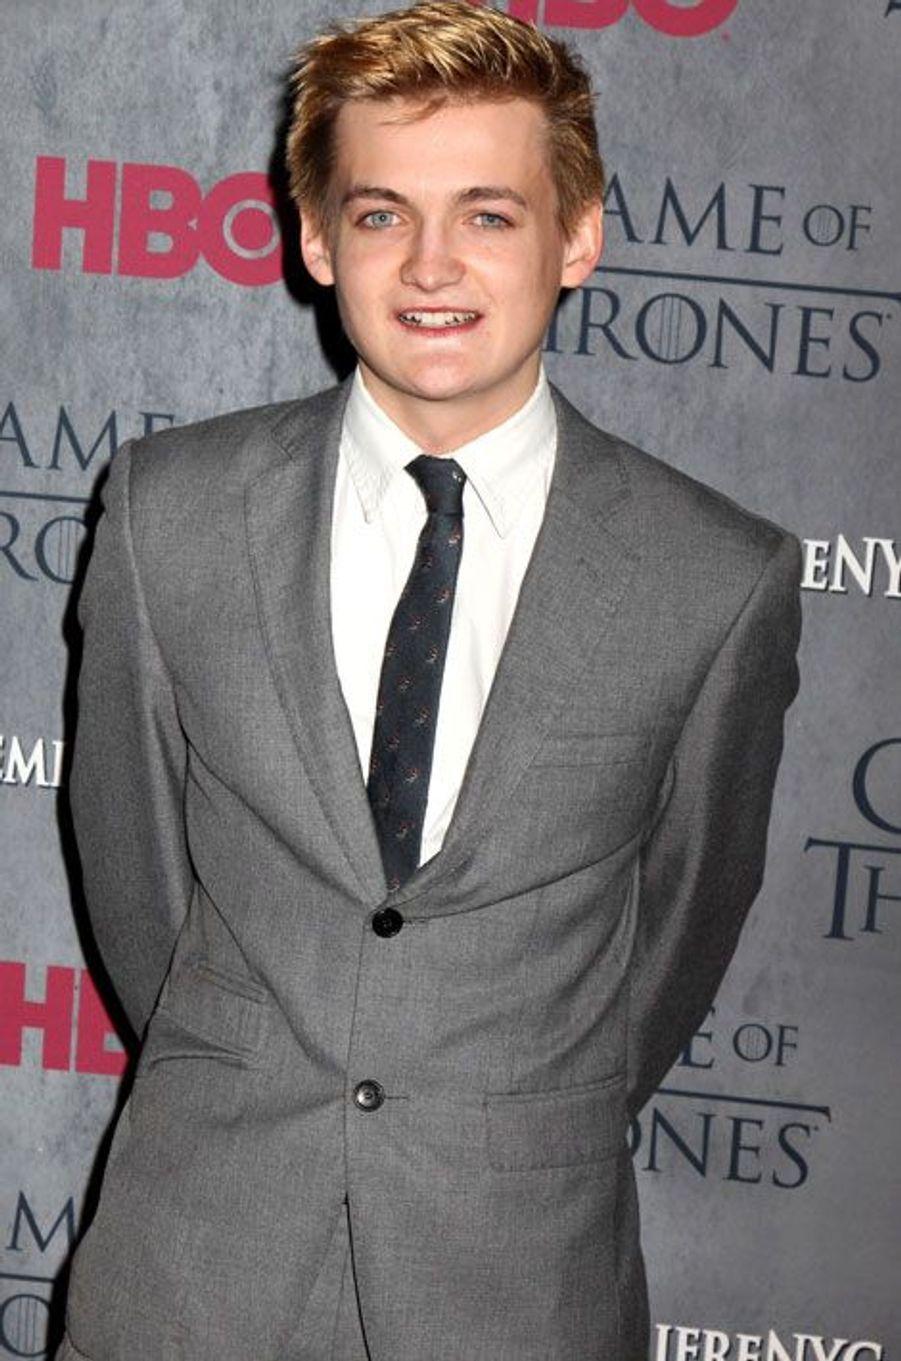 Jack Gleeson (Joffrey Baratheon)